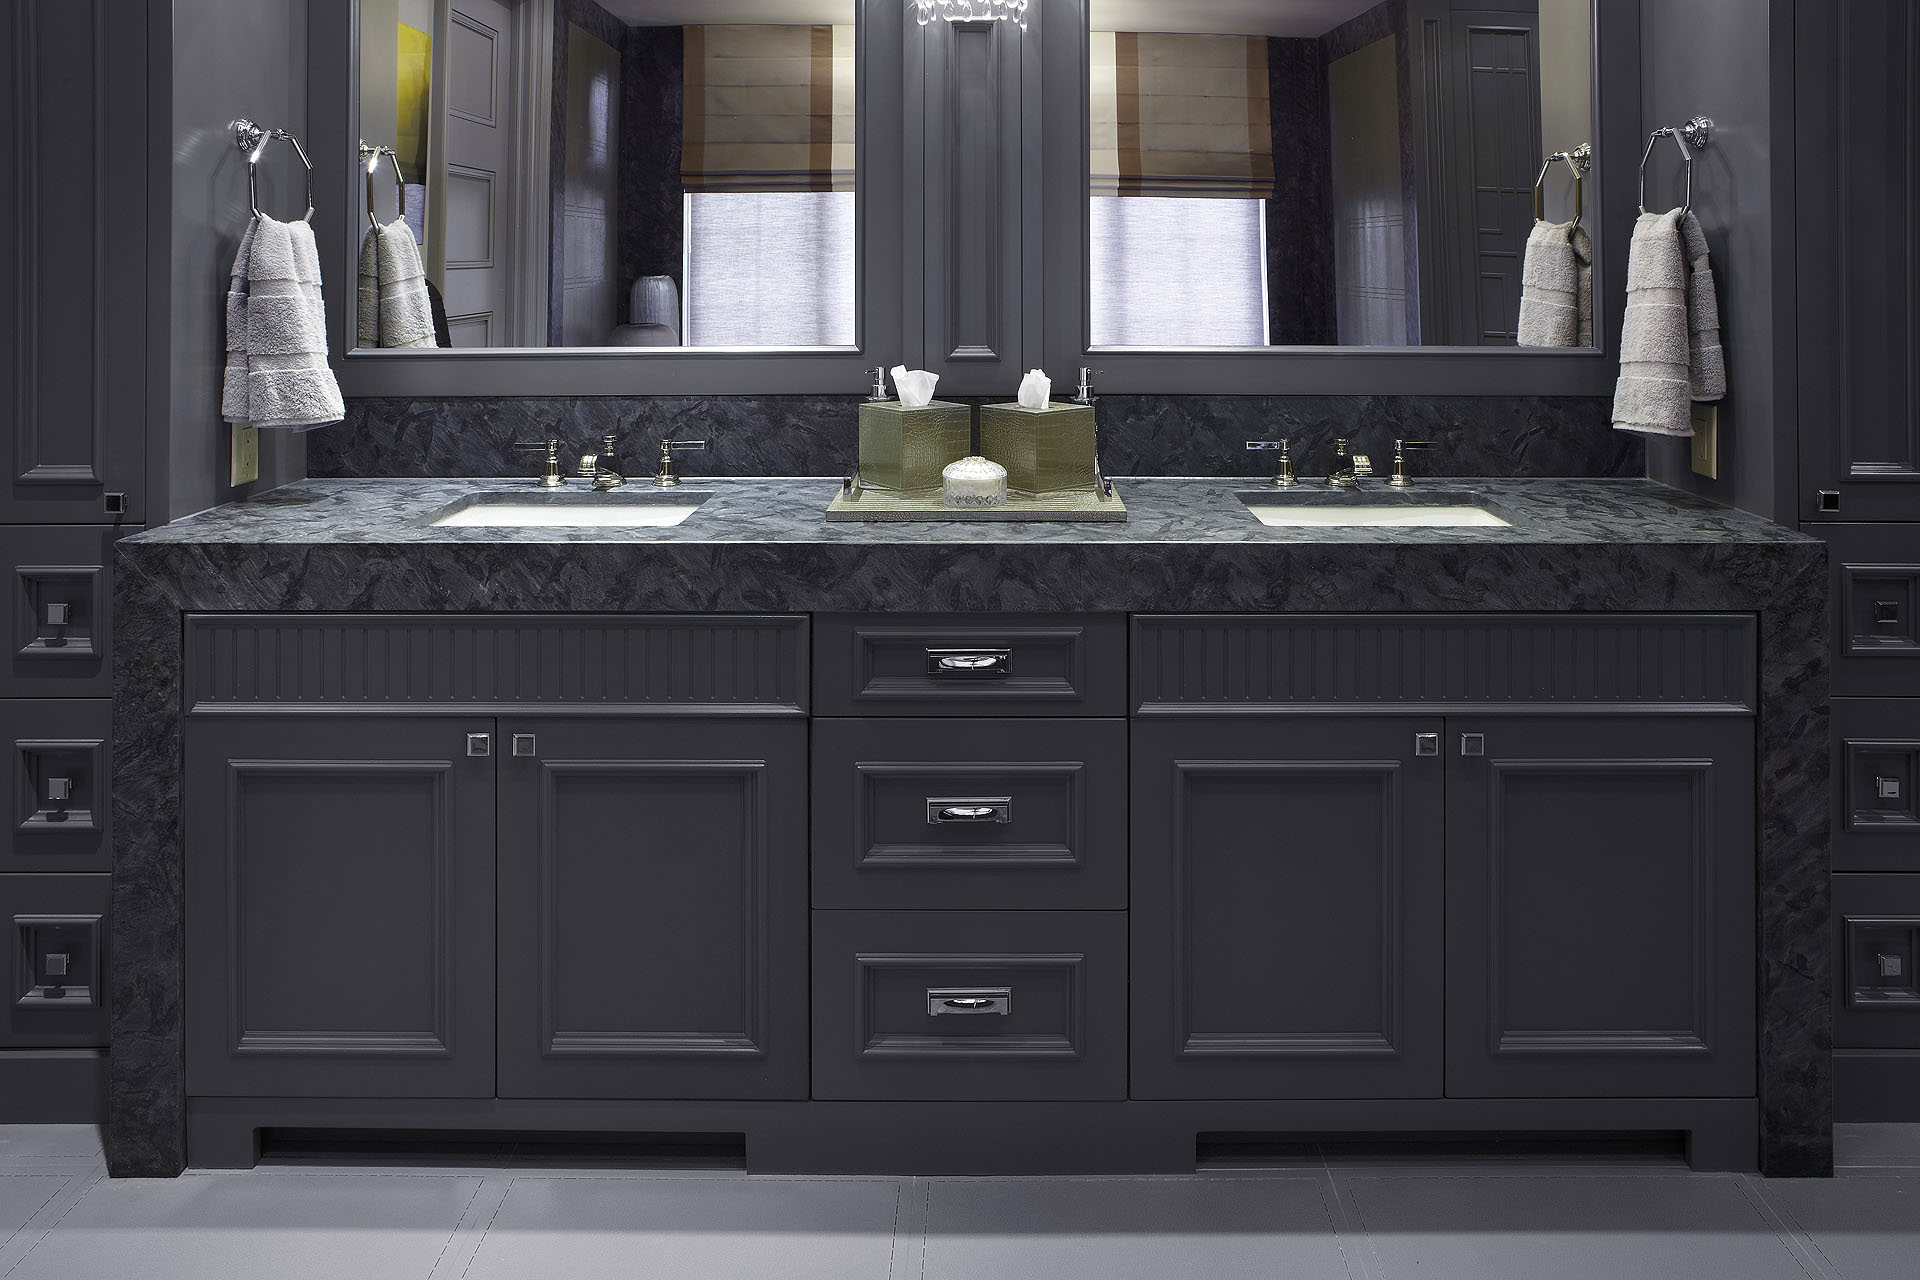 Granite & Marble Countertops Toronto CM Quartz Crown Marble & Granite